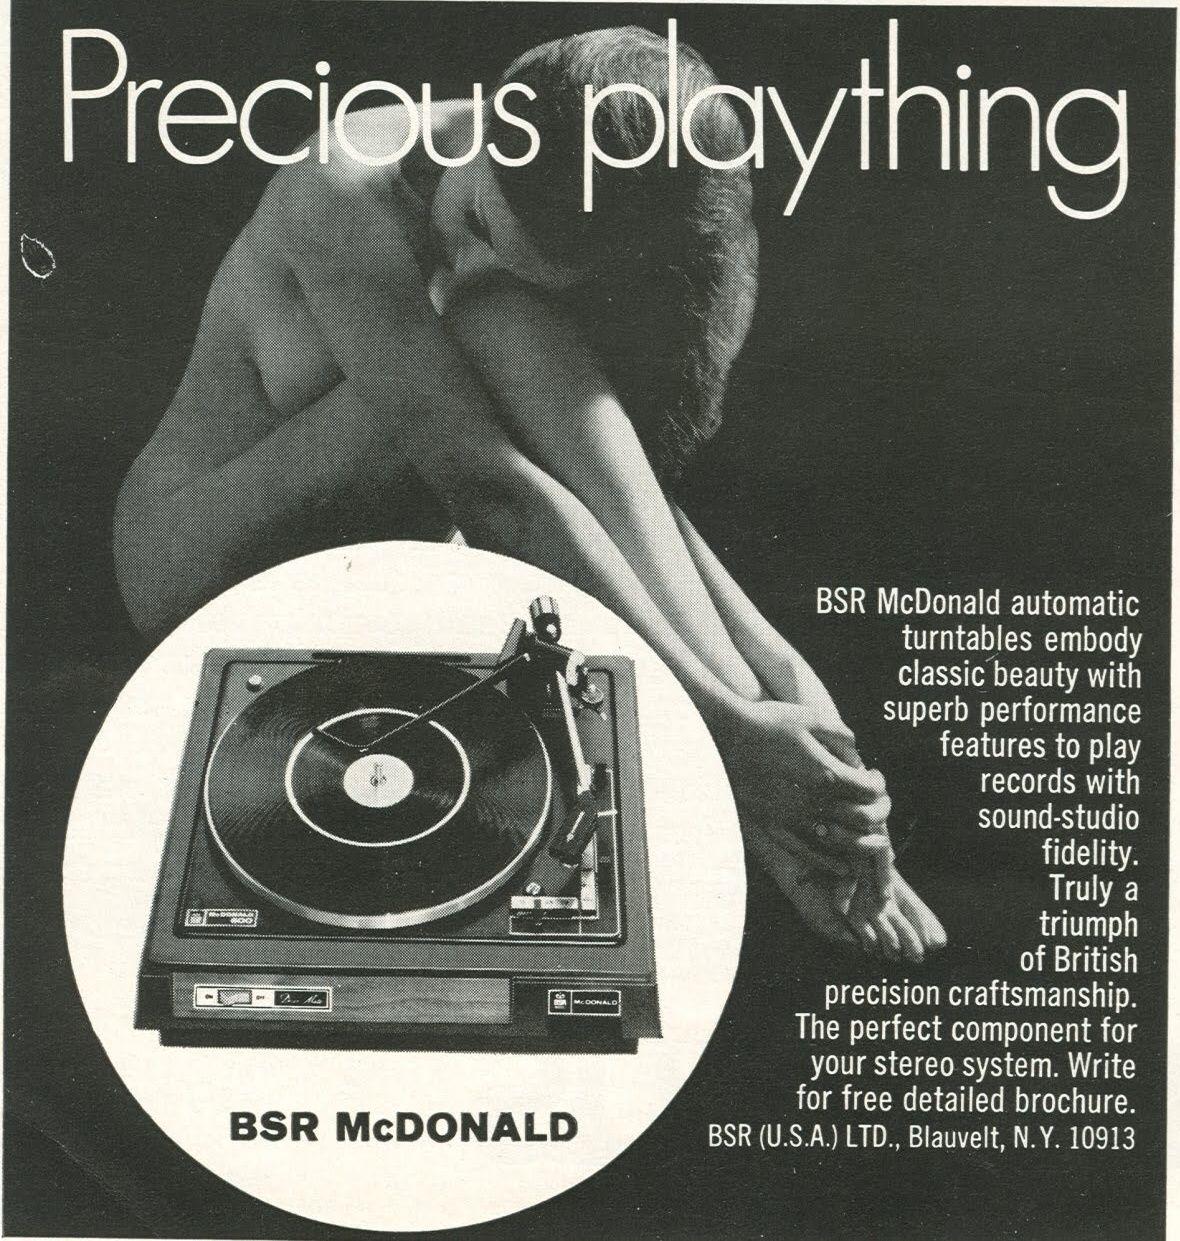 retro vintage modern hi-fi: January 2012